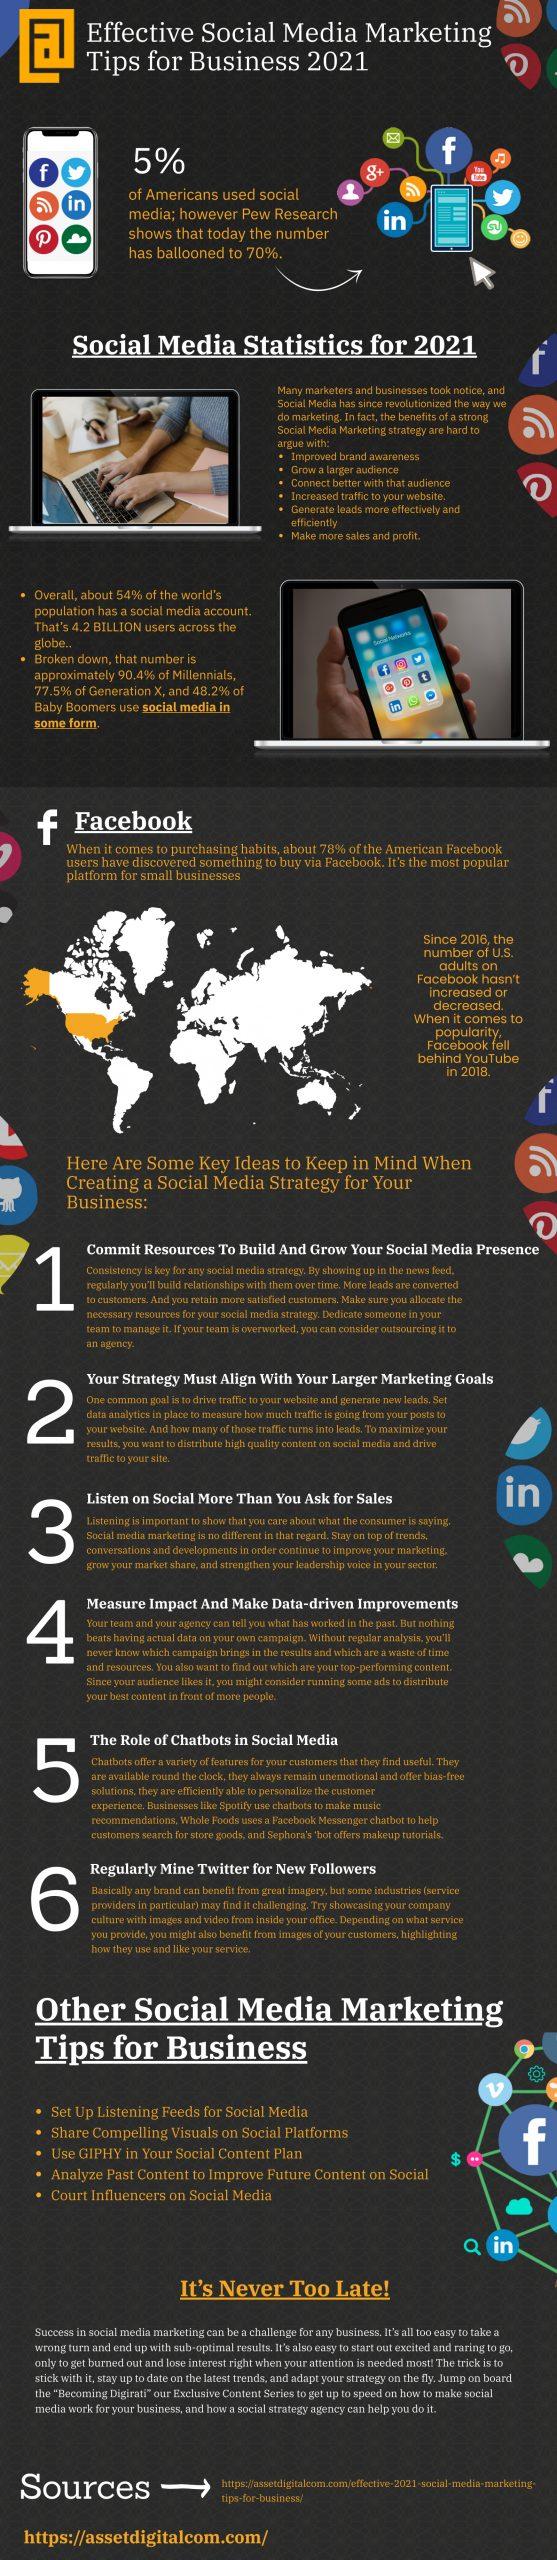 Effective Social Media Marketing Tips for Business